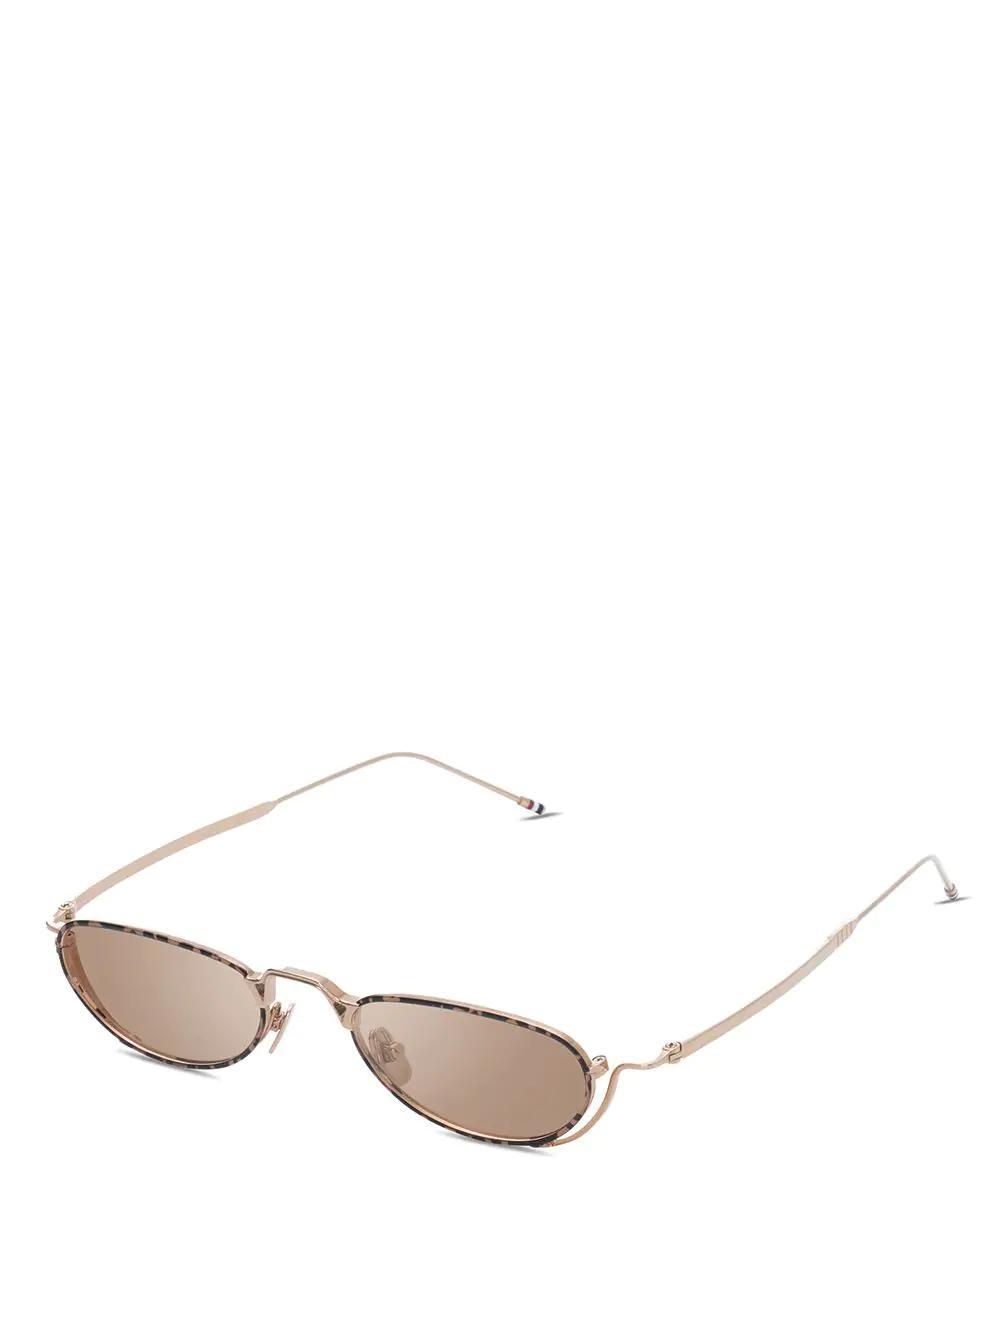 d8bdb1d3c4 Thom Browne Eyewear White Gold   Tortoise Sunglasses